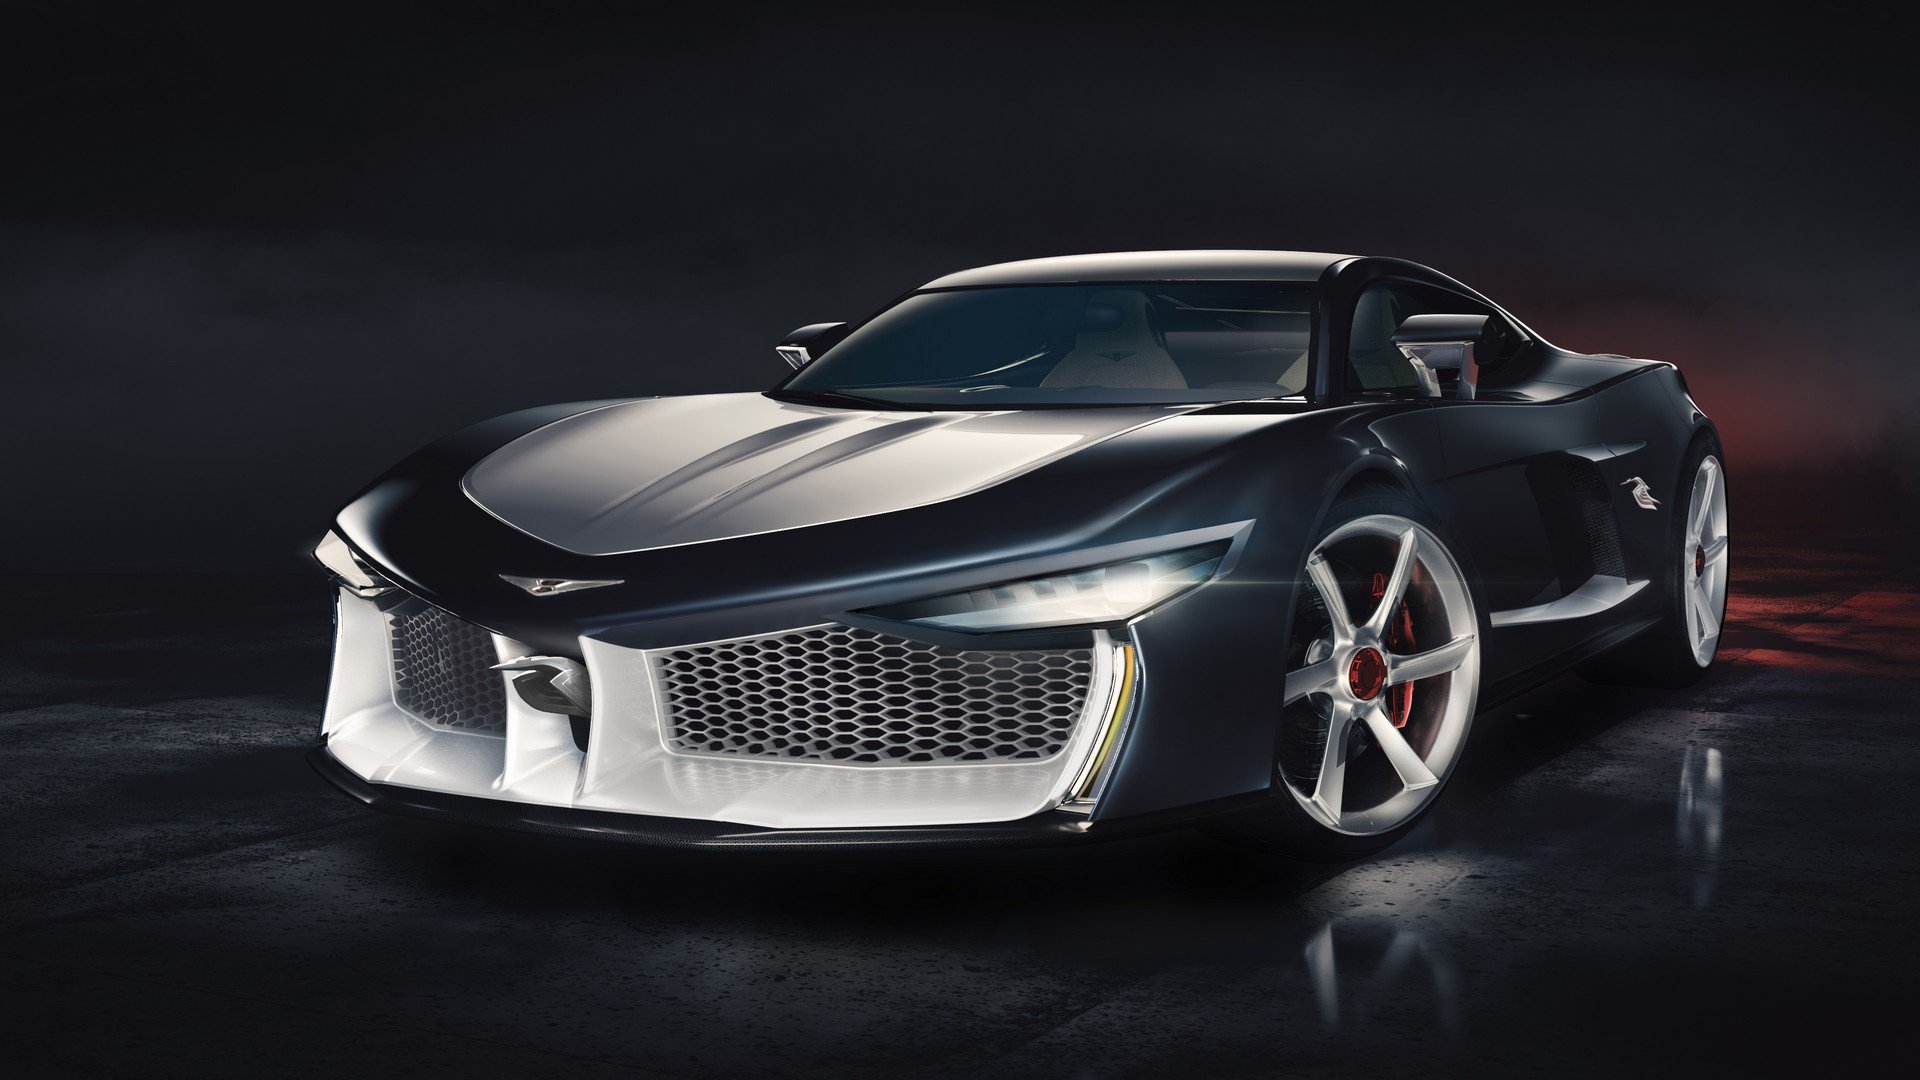 https: img.okeinfo.net content 2019 03 08 15 2027563 bukan-merek-terkenal-hypercar-ini-semburkan-tenaga-mesin-1-070-hp-7Pn3DhupQY.jpg